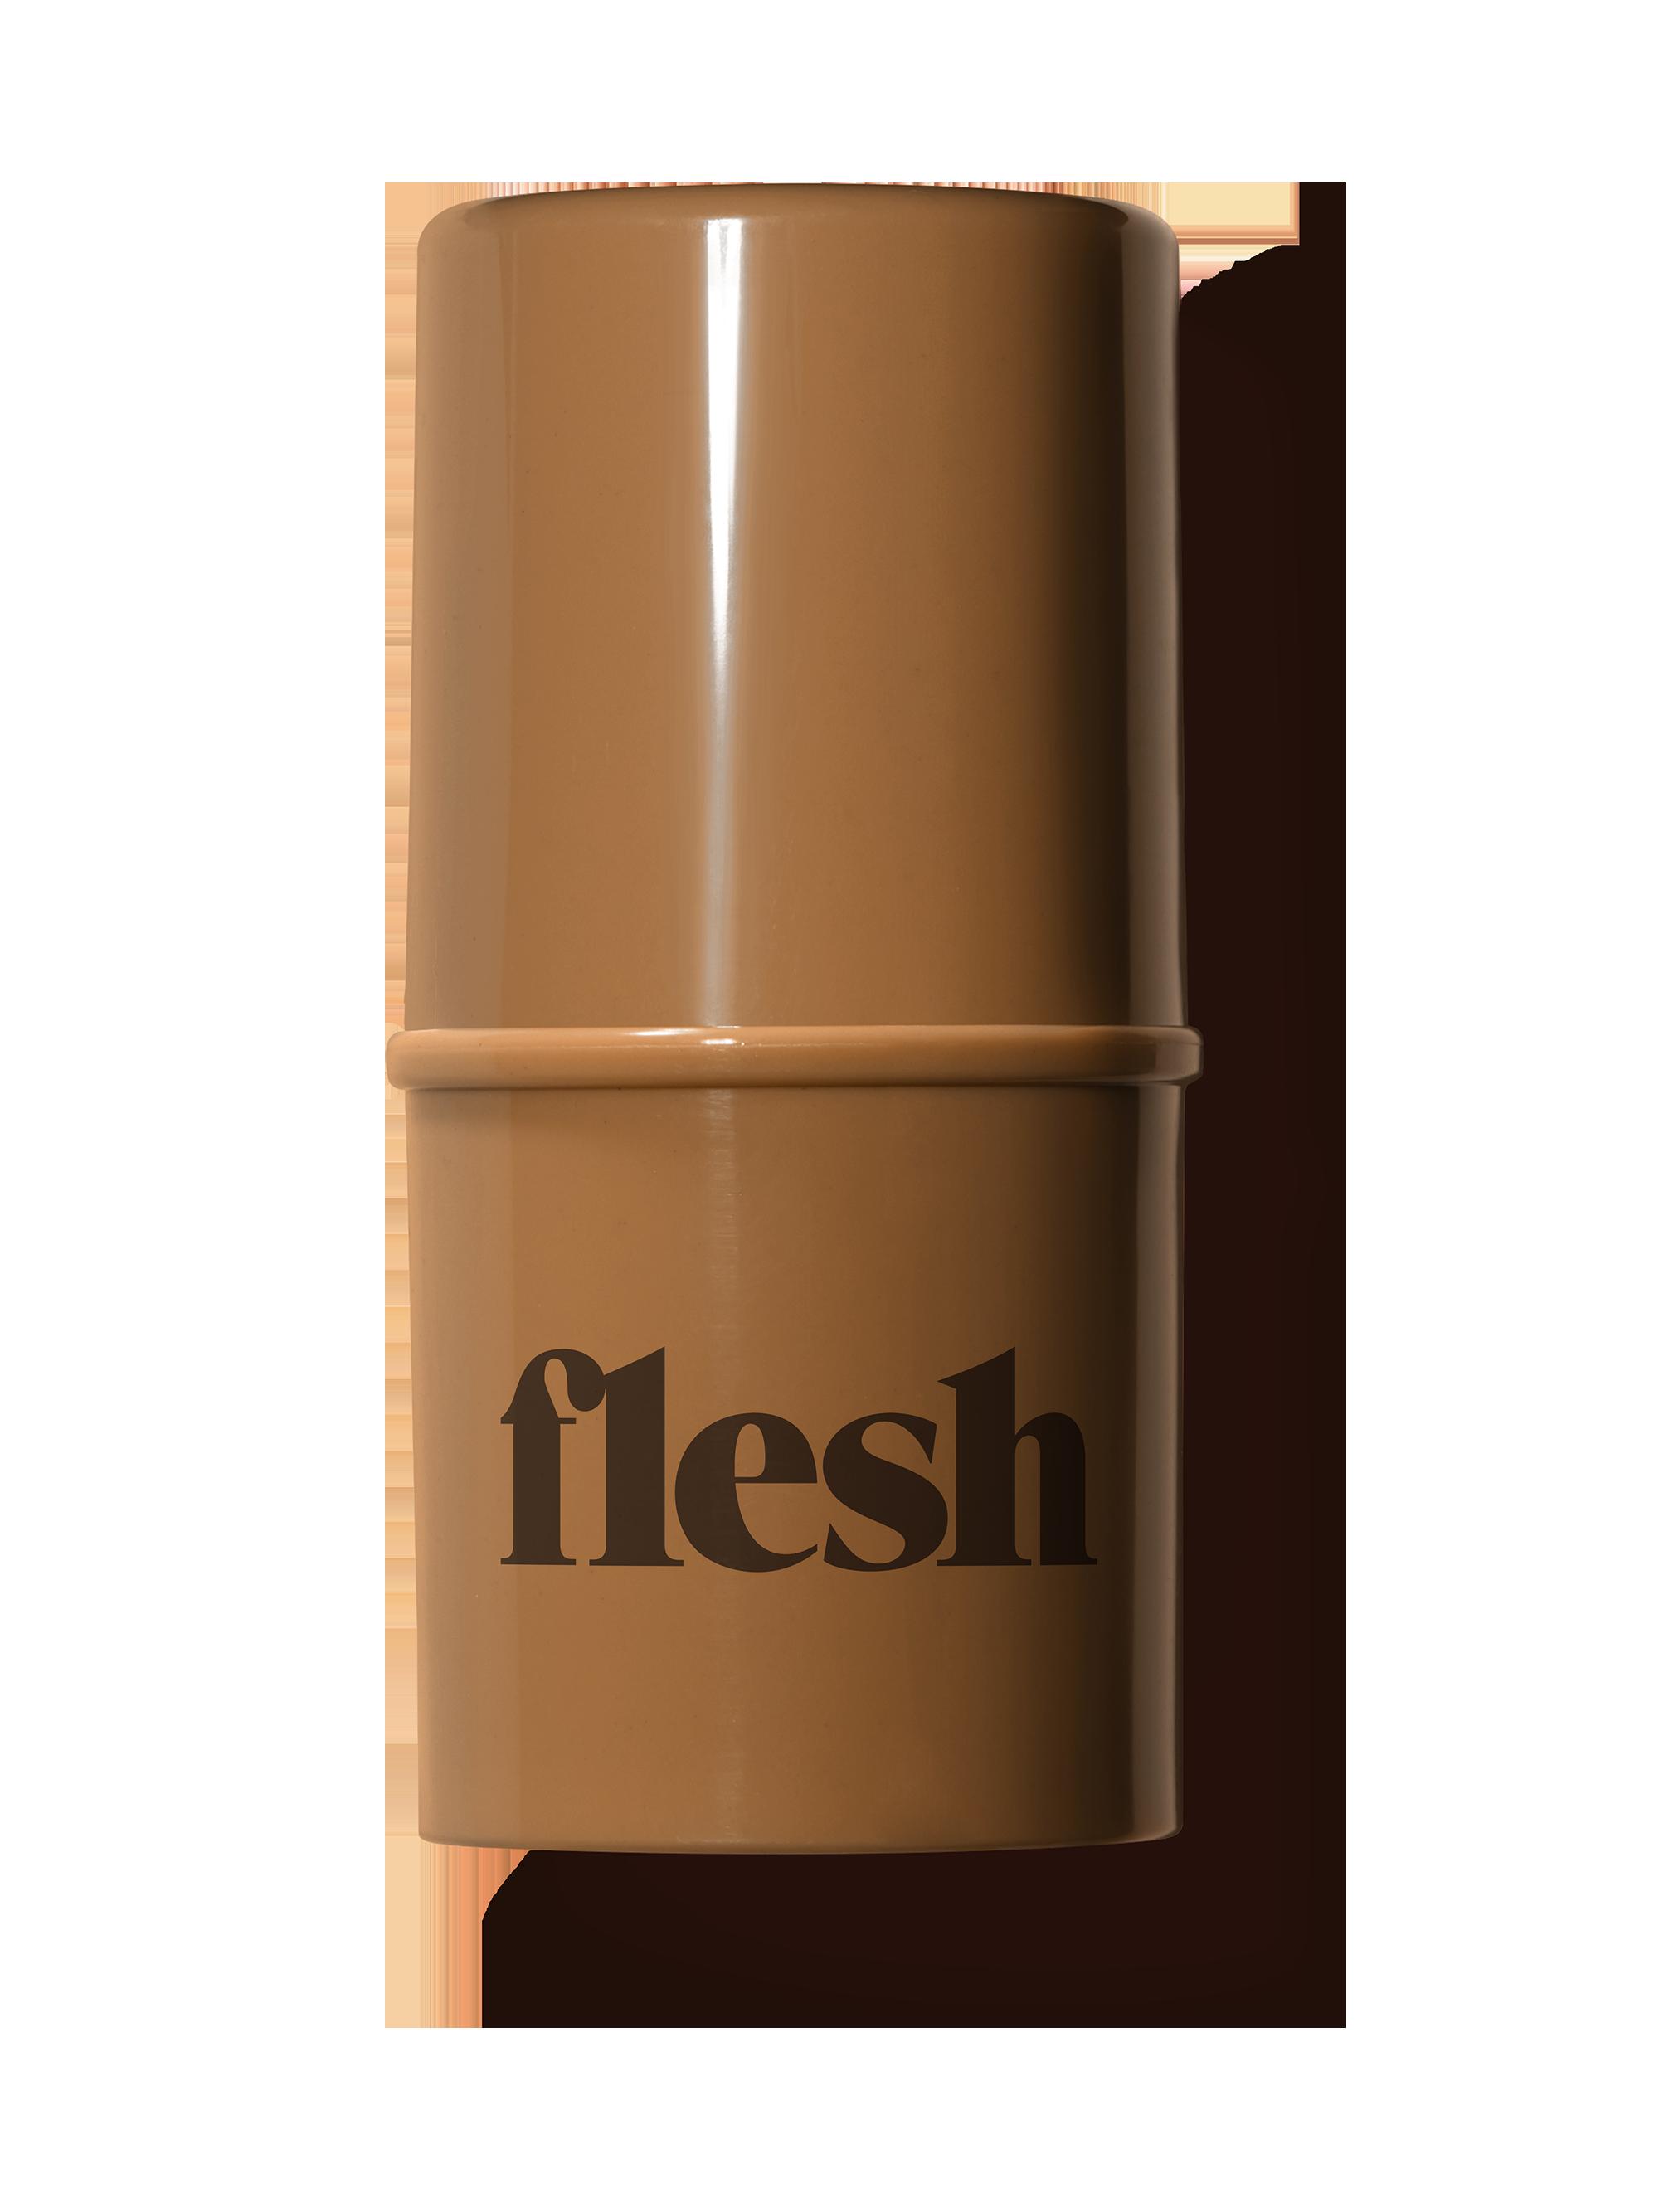 Firm Flesh